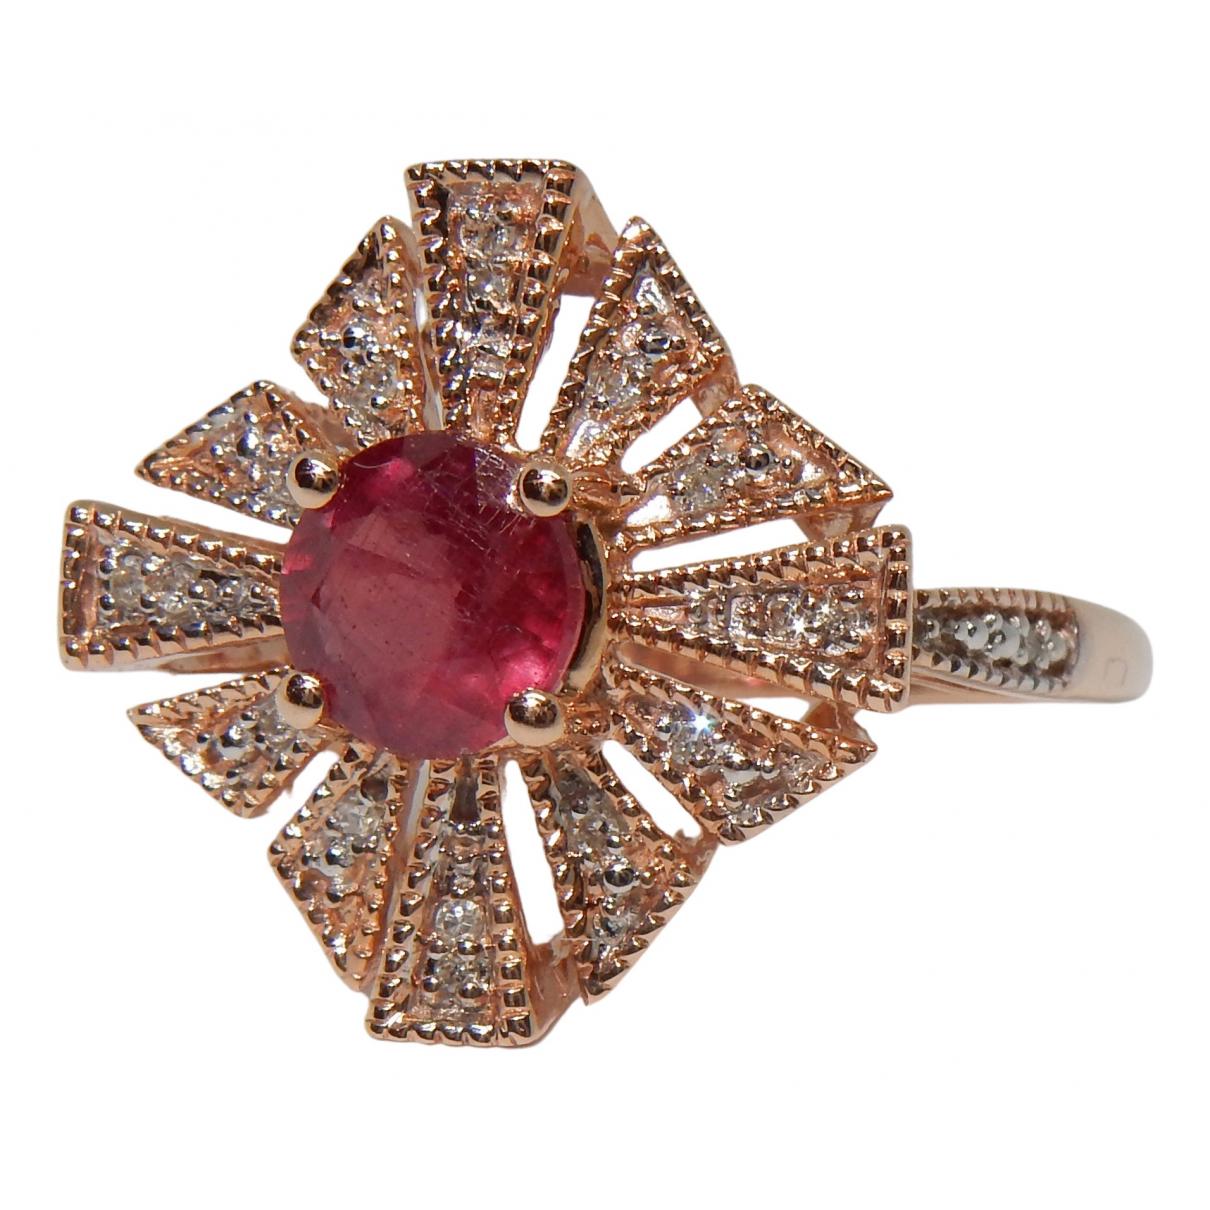 - Bague Rubis pour femme en or rose - rose